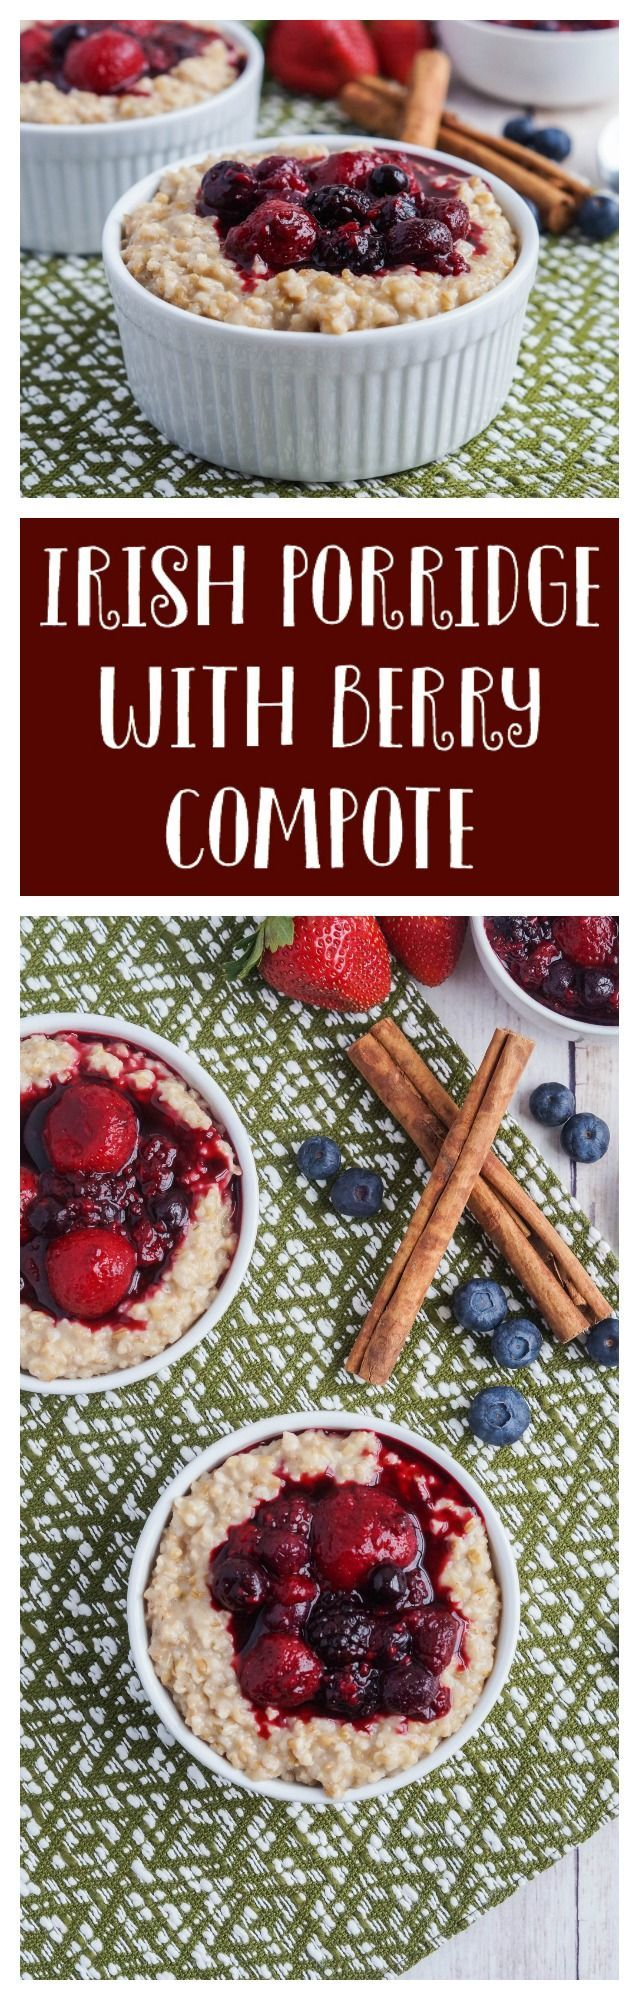 Irish Porridge with Berry Compote  #irish #ireland #porridge #oat #oatmeal #berry #berries #compote #breakfast #stpatrick #stpatricksday